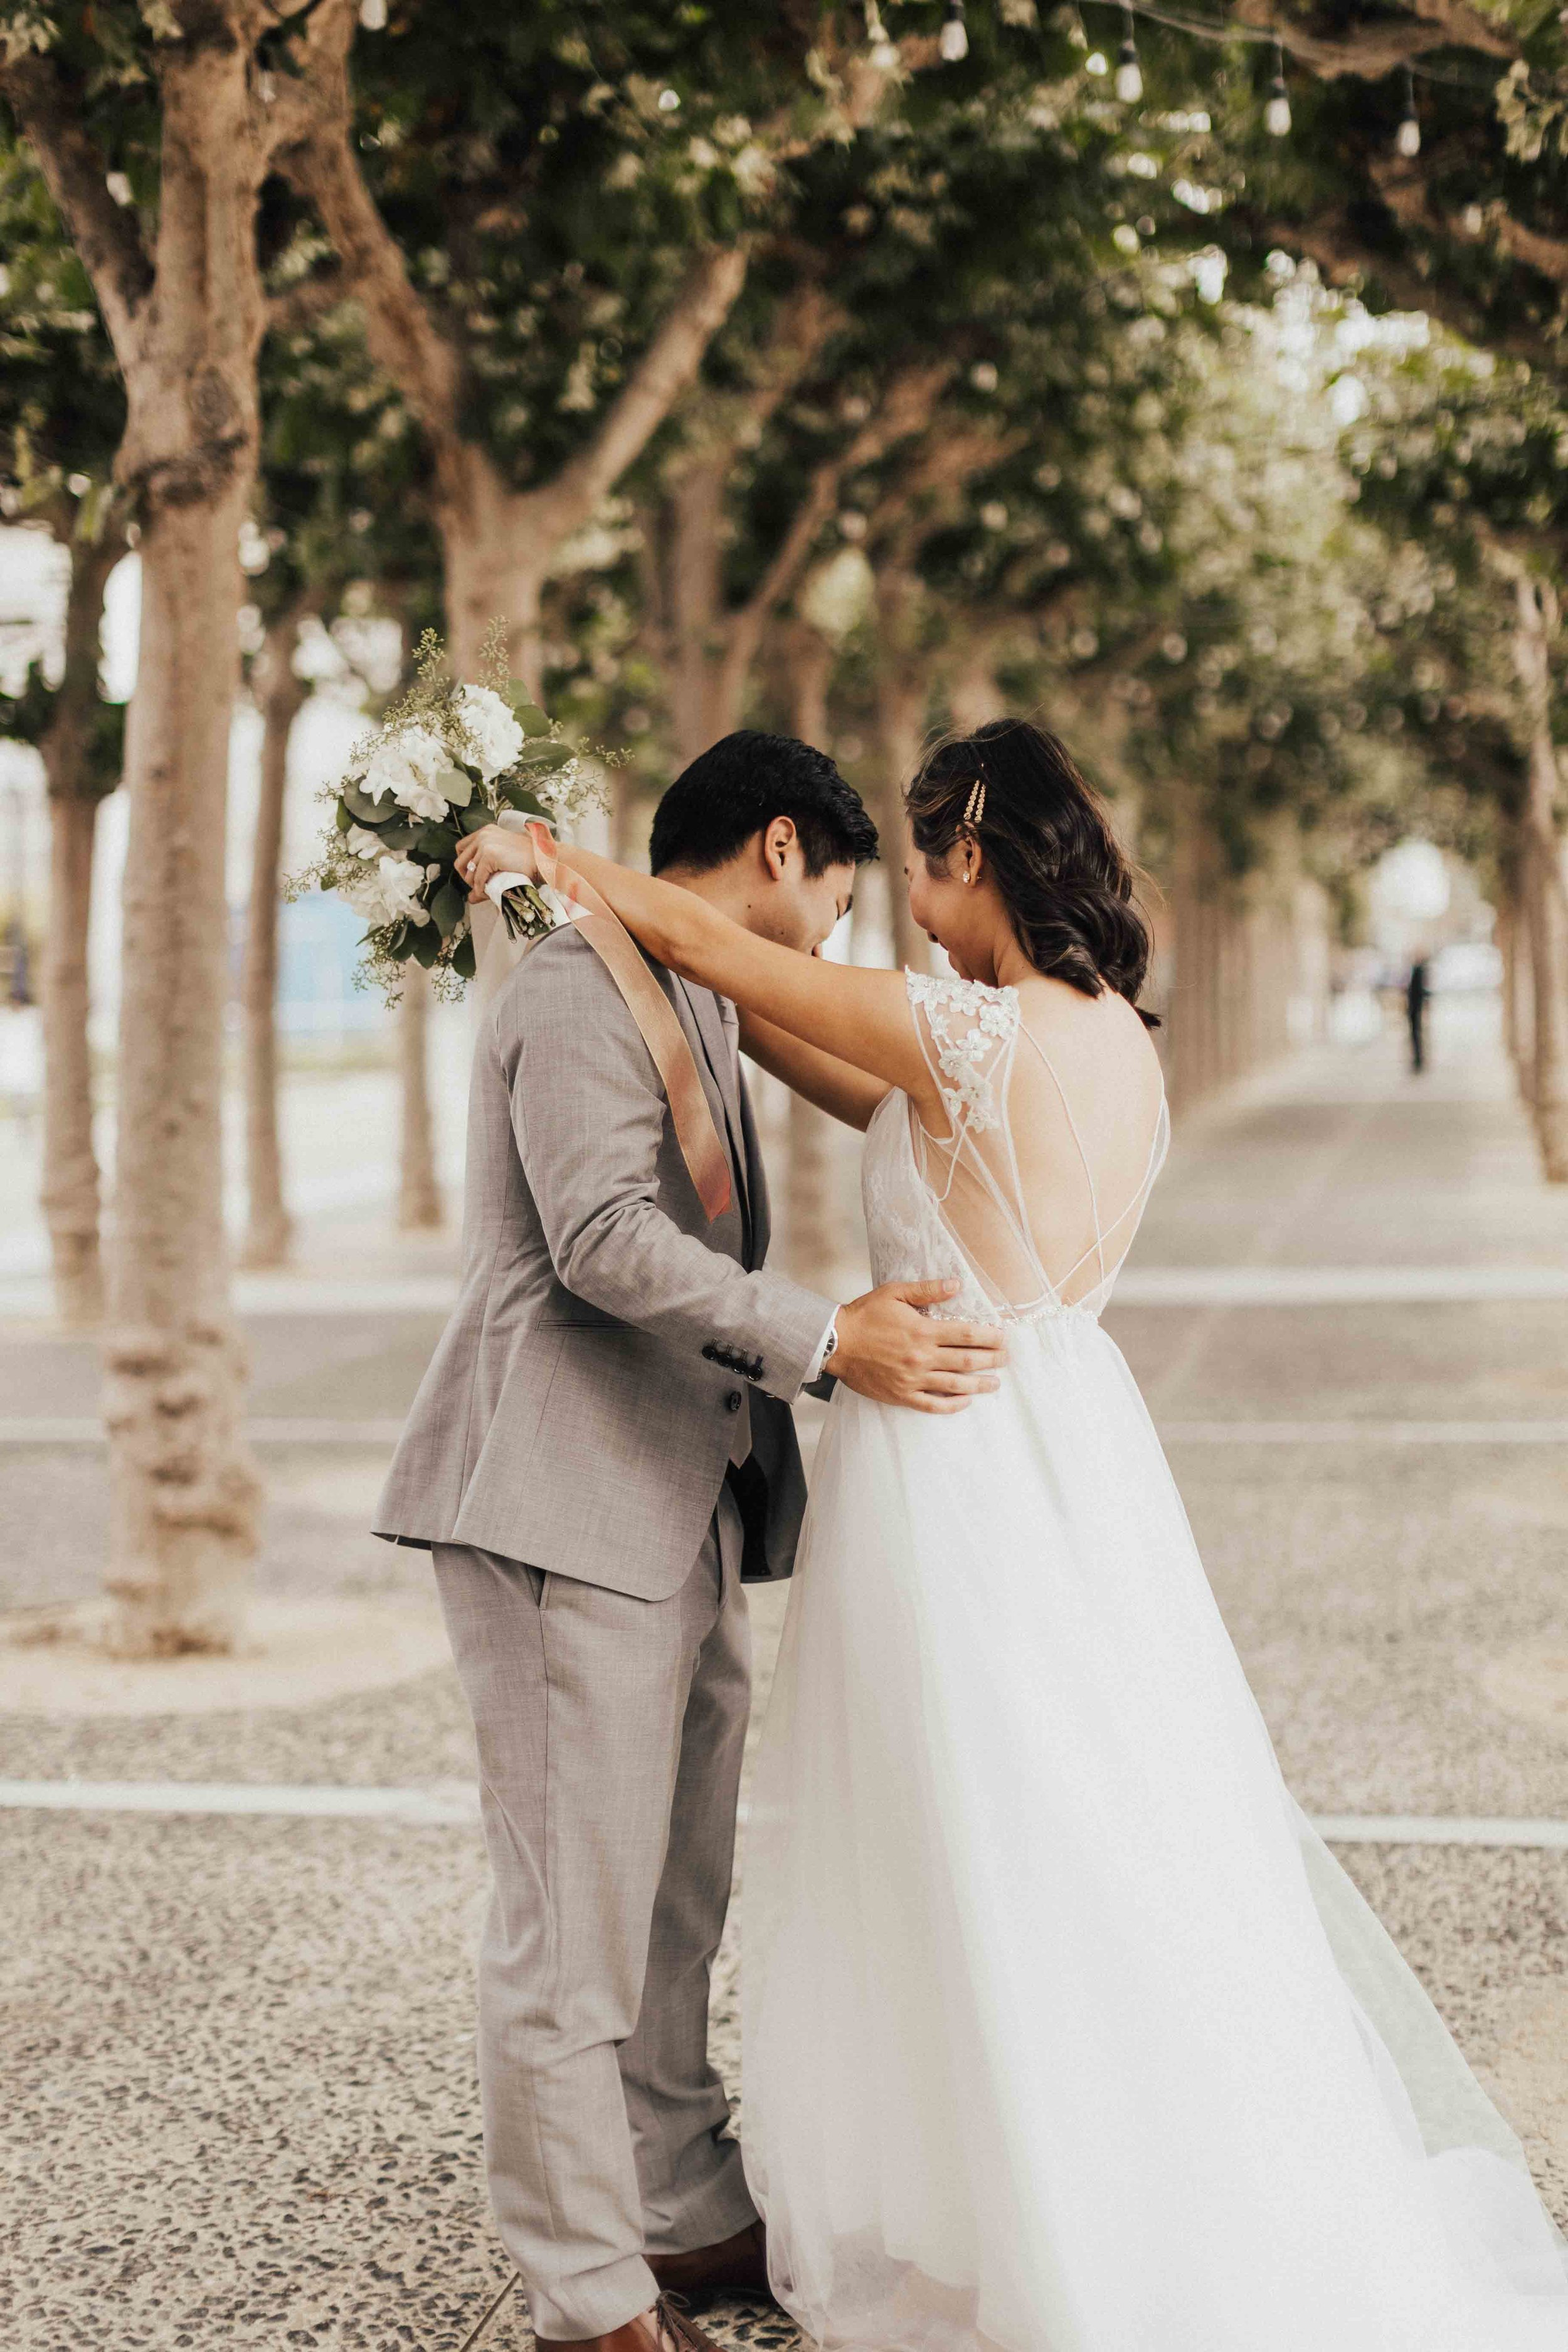 weddingday (4 of 67).jpg